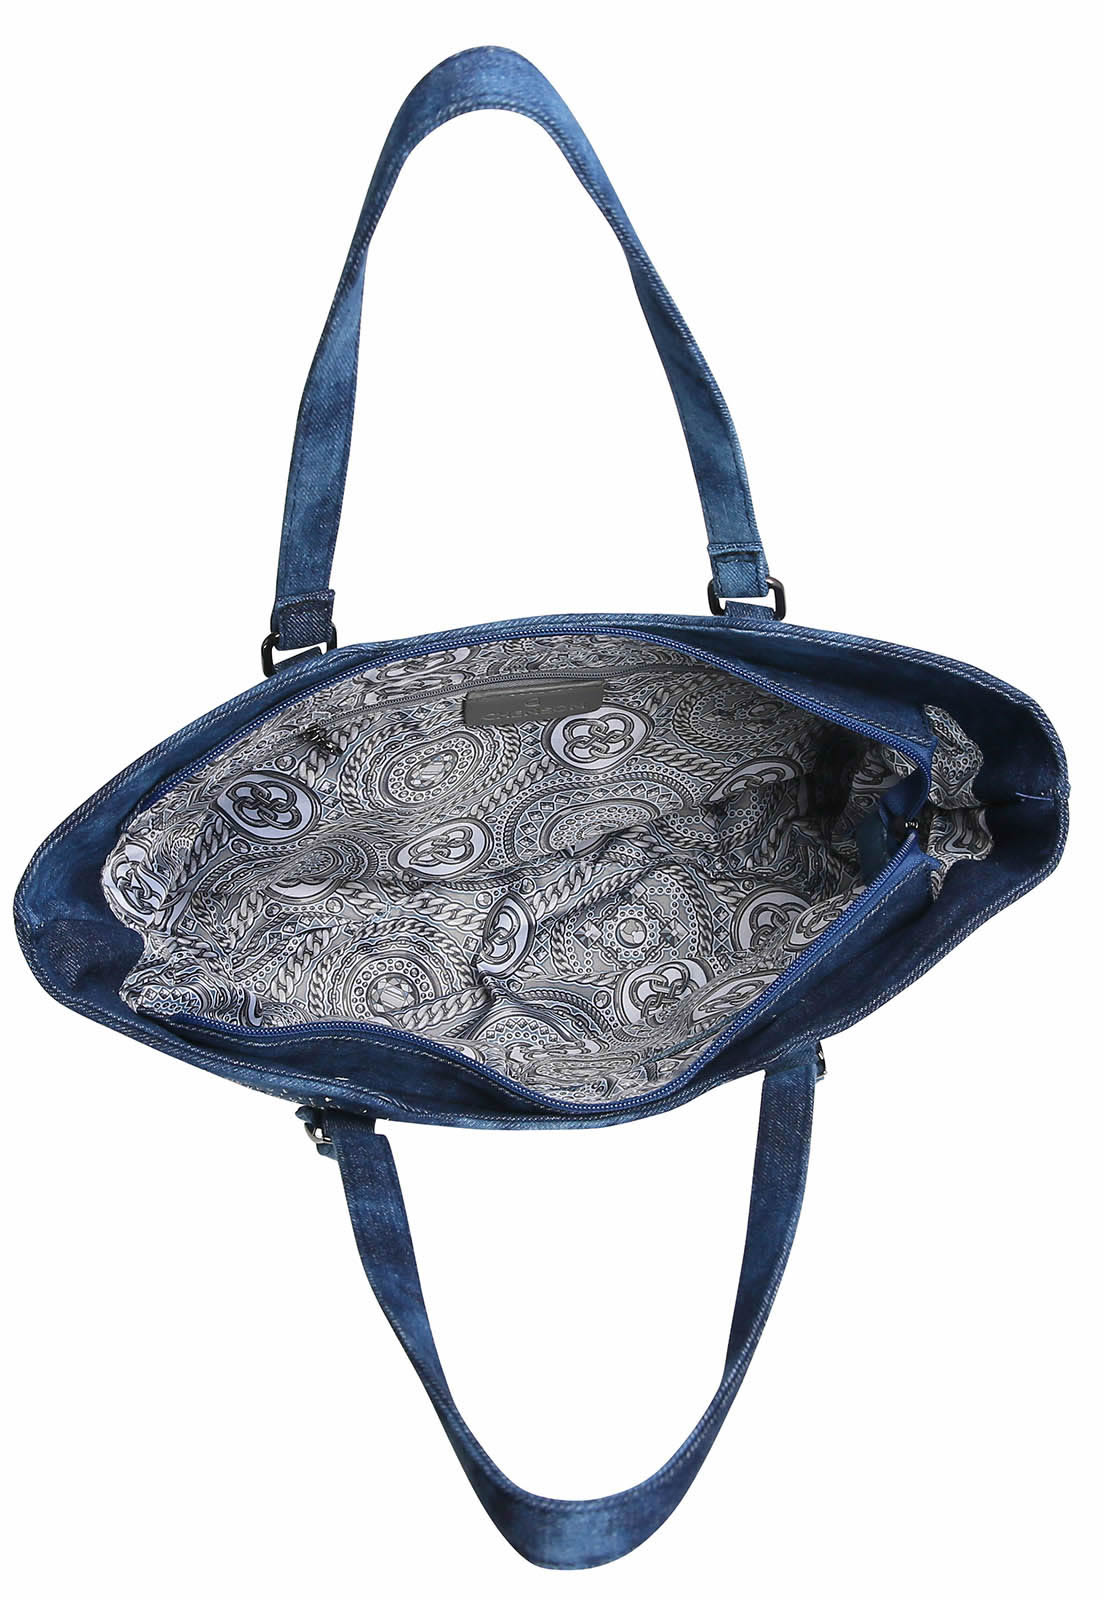 Bolsa Feminina de Ombro Star Jeans Chenson Azul